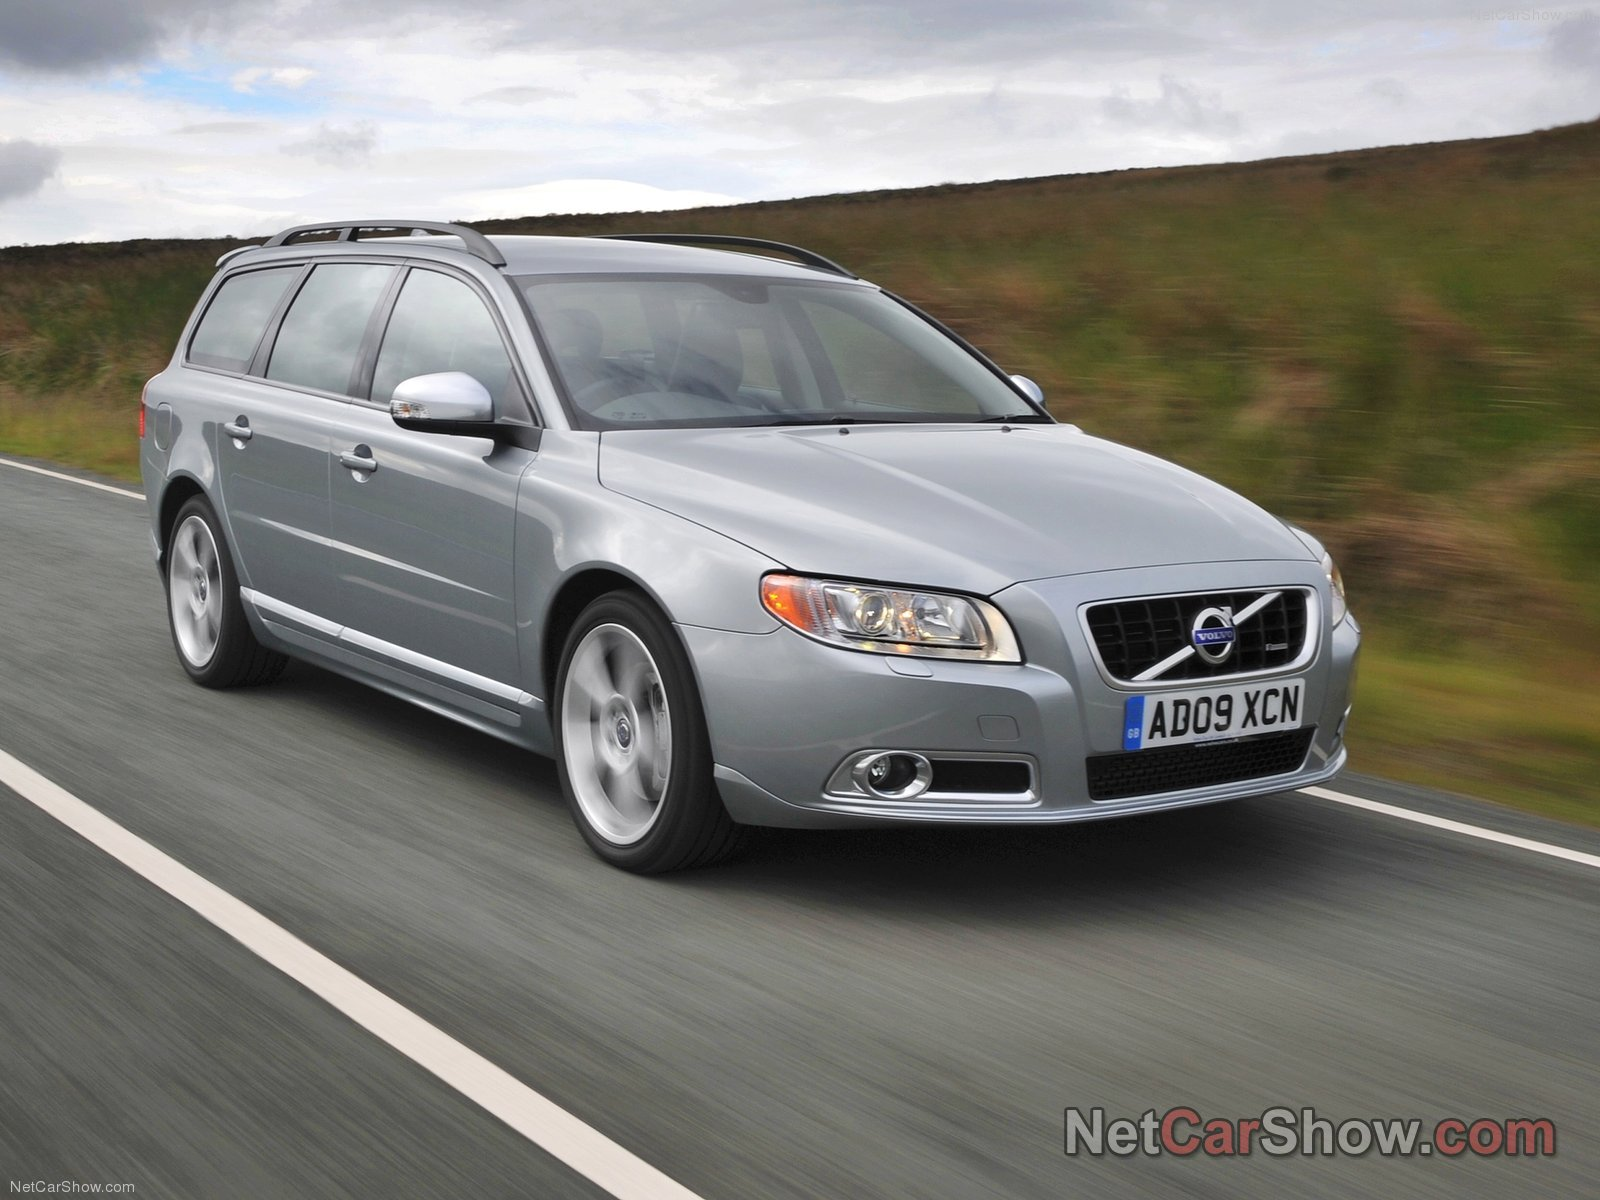 2010 Volvo V70 - Price, Photos, Reviews & Features   2011 Volvo V70 Wagon